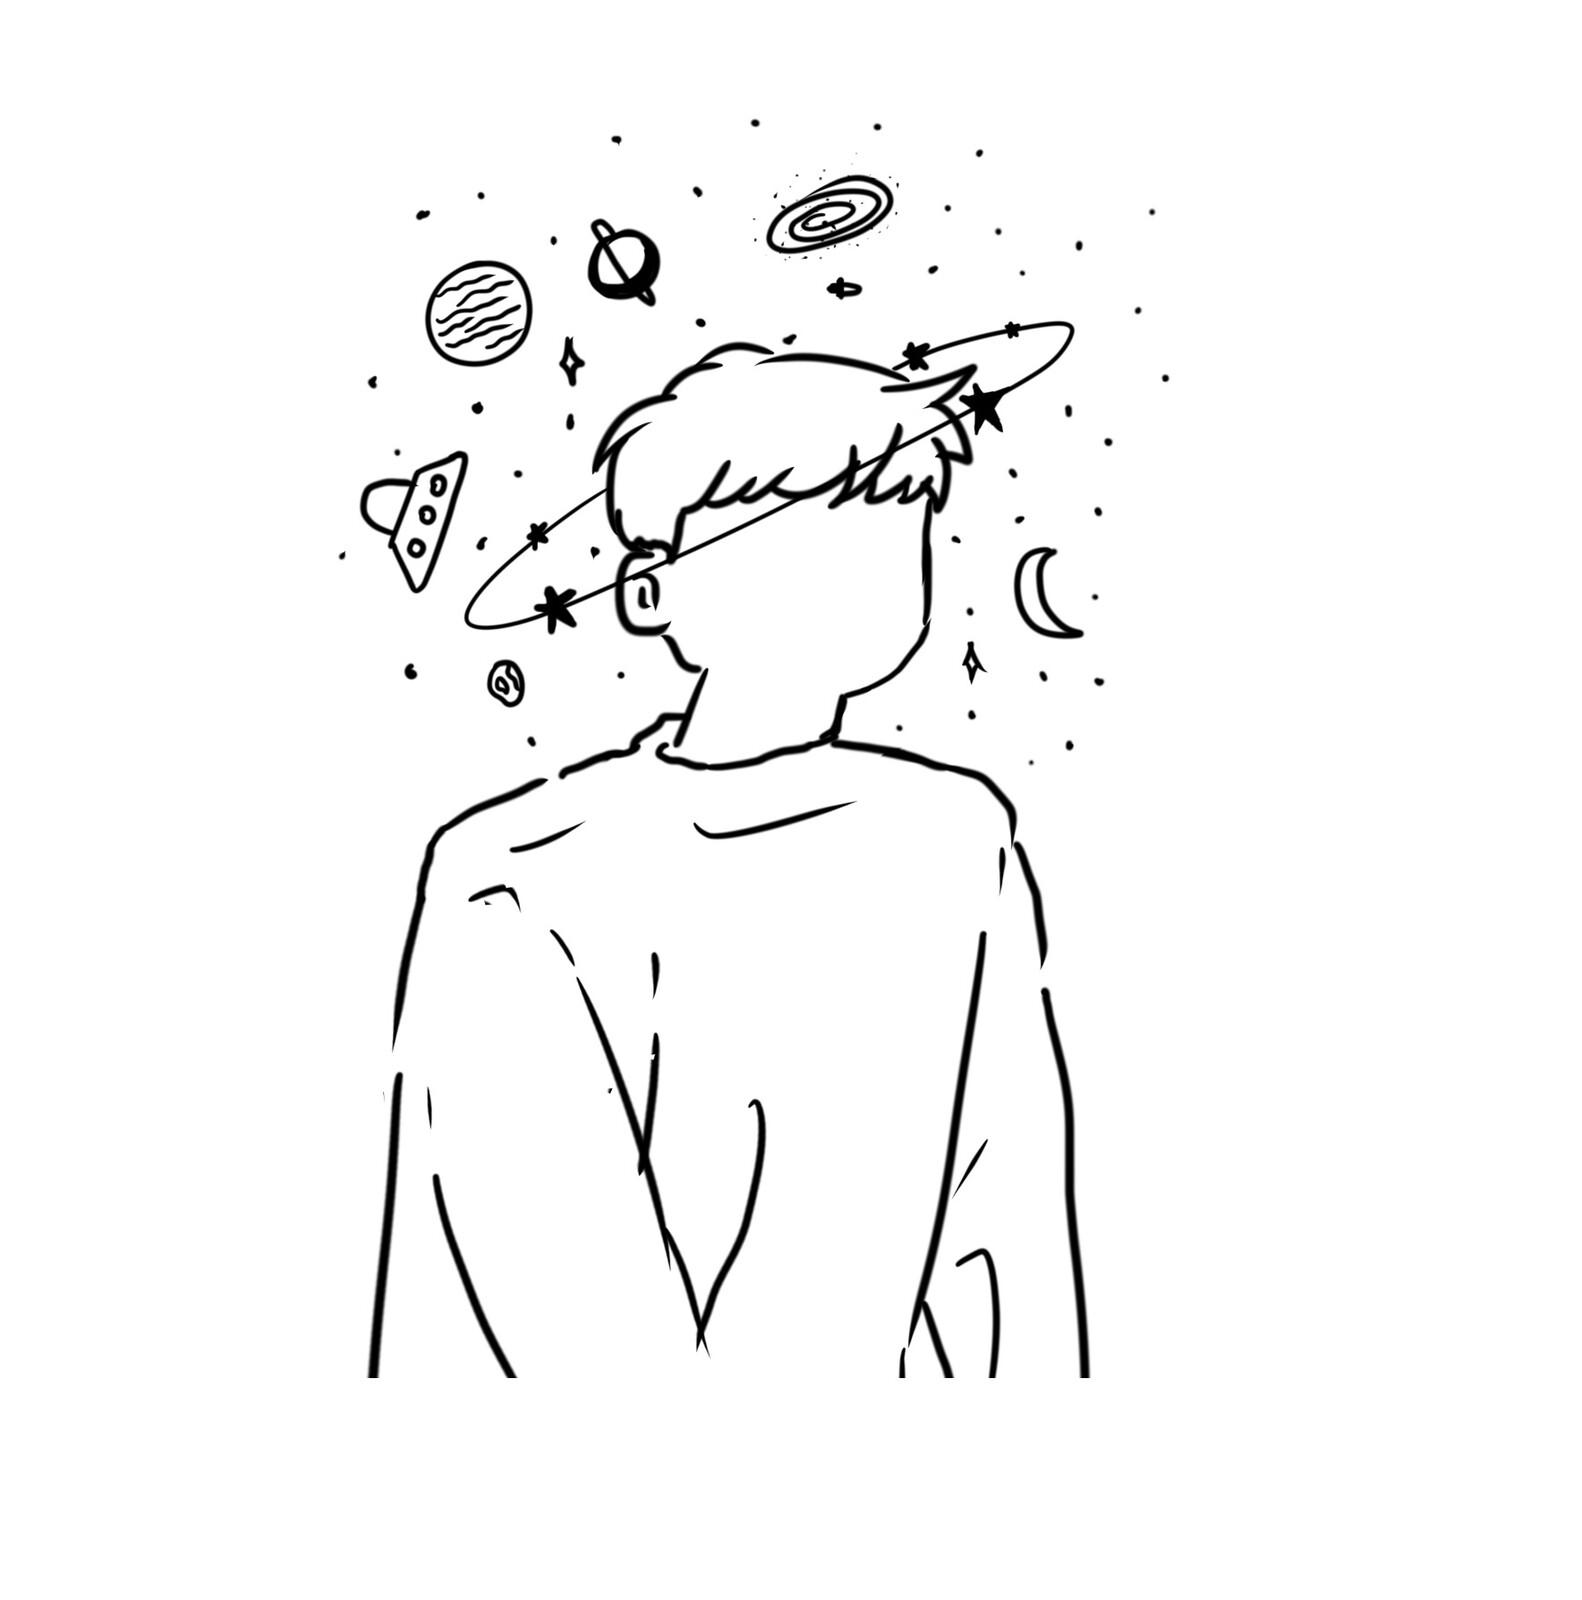 ArtStation   Aesthetic Space Boy, 𝓜𝓸𝓸𝓷 𝓝𝔂𝔁